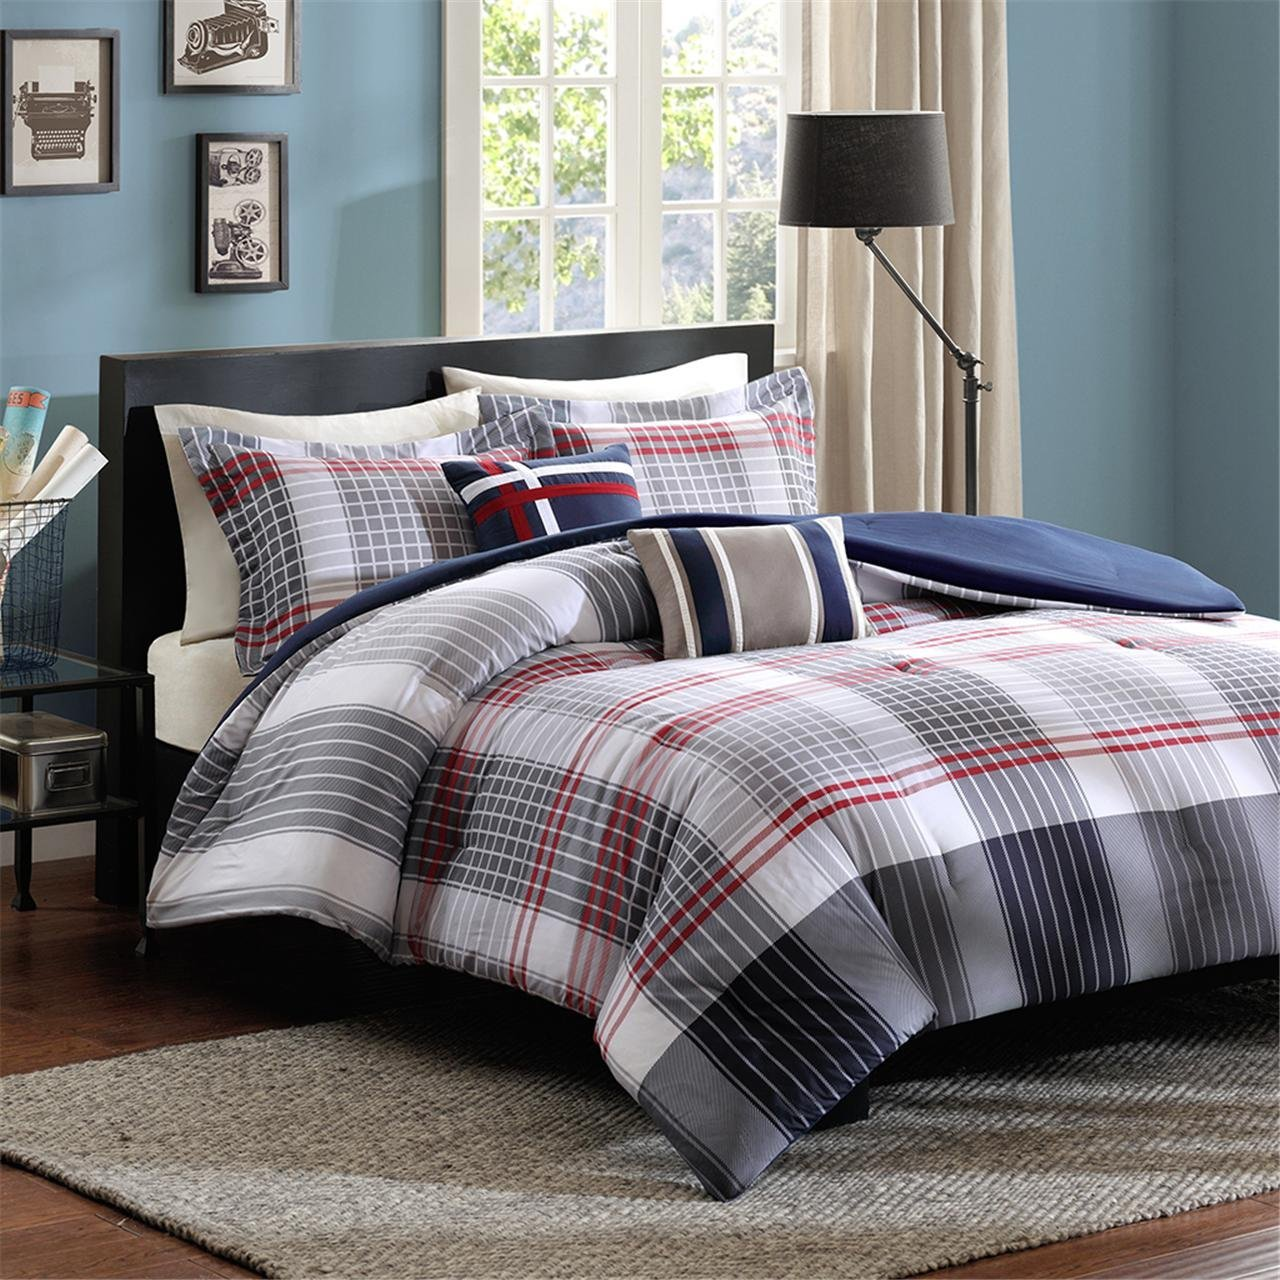 Intelligent Design Caleb Comforter Set Blue Twin//Twin XL ID10-174